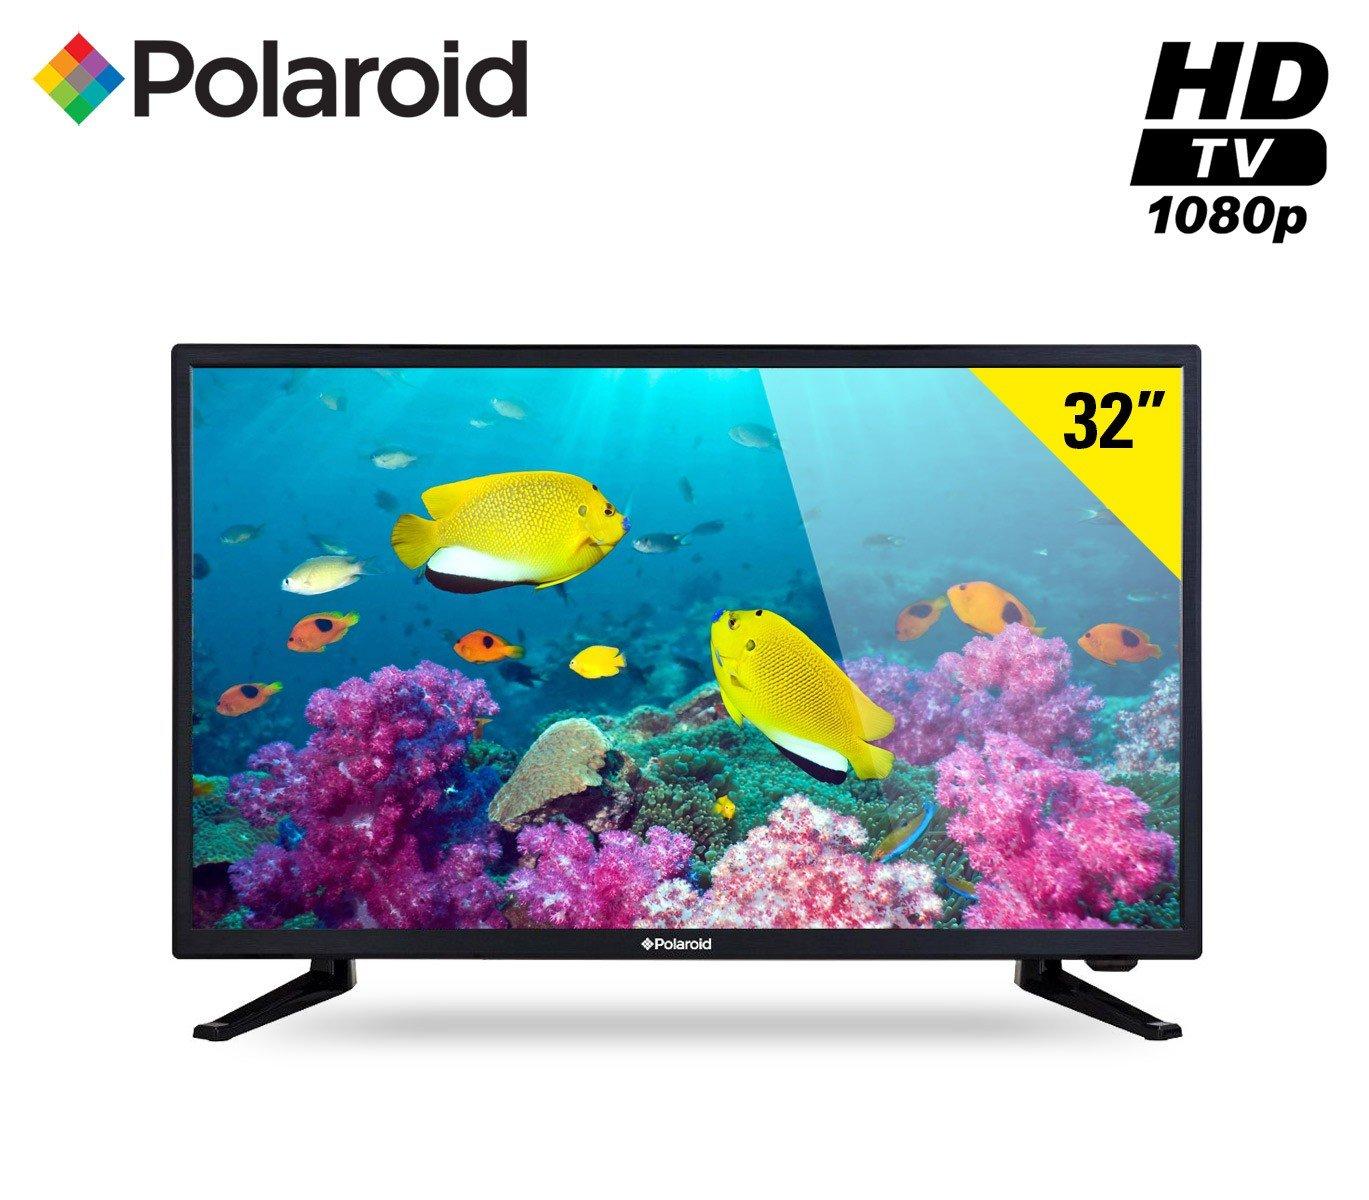 MWS2447 TQL32R4 Polaroid - Pantalla plana (32 pulgadas, televisor LED Full HD, 1366 x 768 HD, 81 cm): Amazon.es: Electrónica